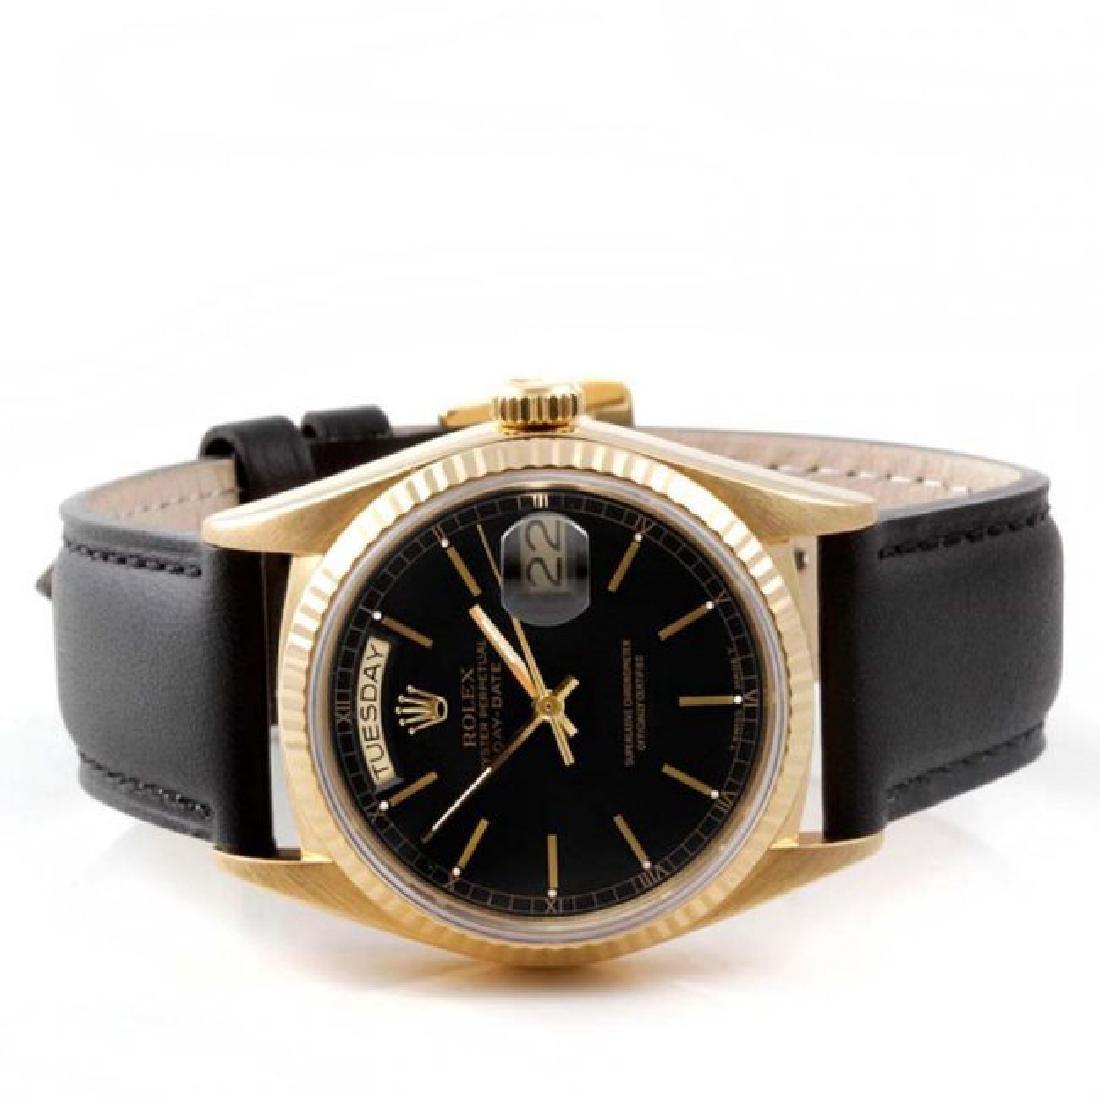 Rolex Men's 18K President Black Dial Watch - 2